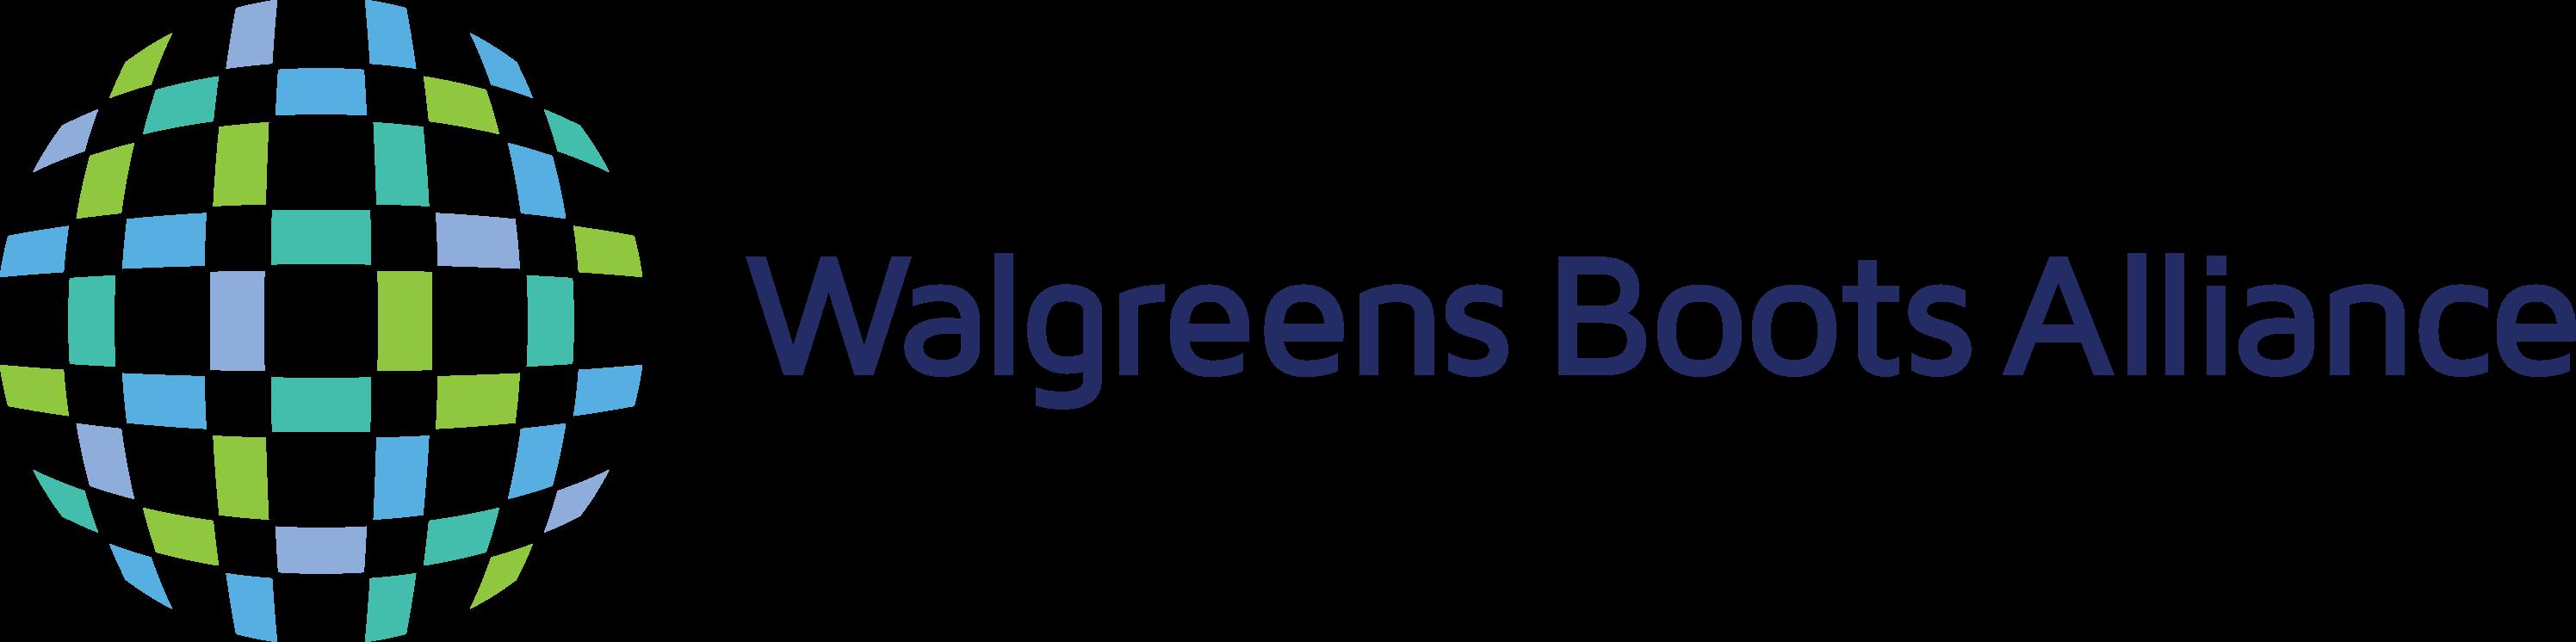 Walgreens Boots Alliance (NASDAQ:WBA) Company Logo